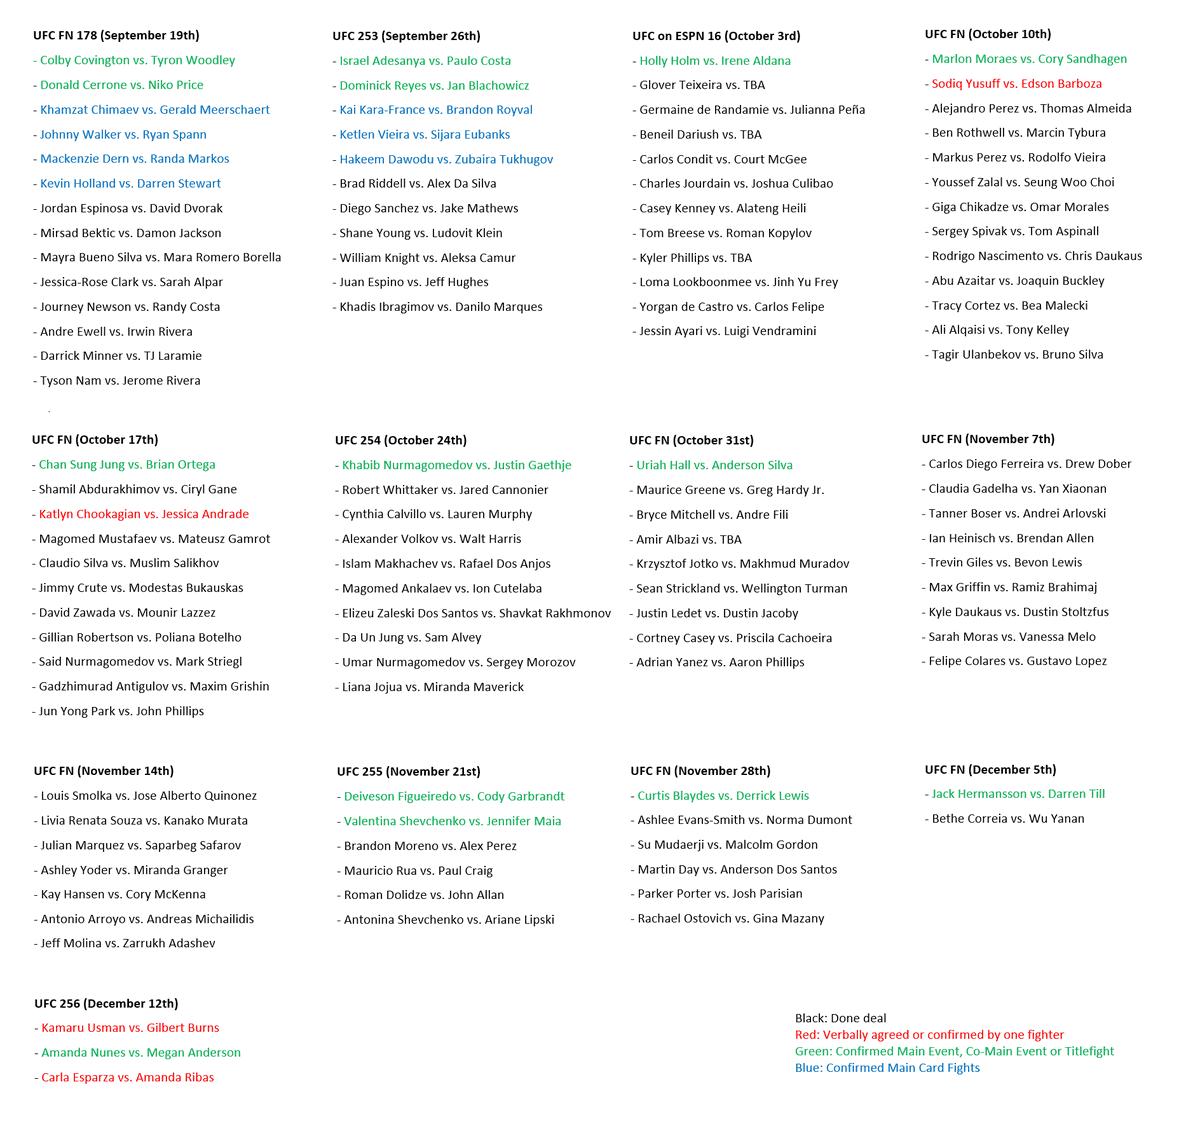 ***Updated Schedule UFC Fights 9/18/20***  Fight Island events. - September 26th, October 3rd, October 10th, October 17th and October 24th.  #UFCVegas11 #UFC253 #UFC254 #UFC255 #UFC256 #UFCFightIsland4 #UFCFightIsland5 #UFCFightIsland6 https://t.co/O3v7Yu15at